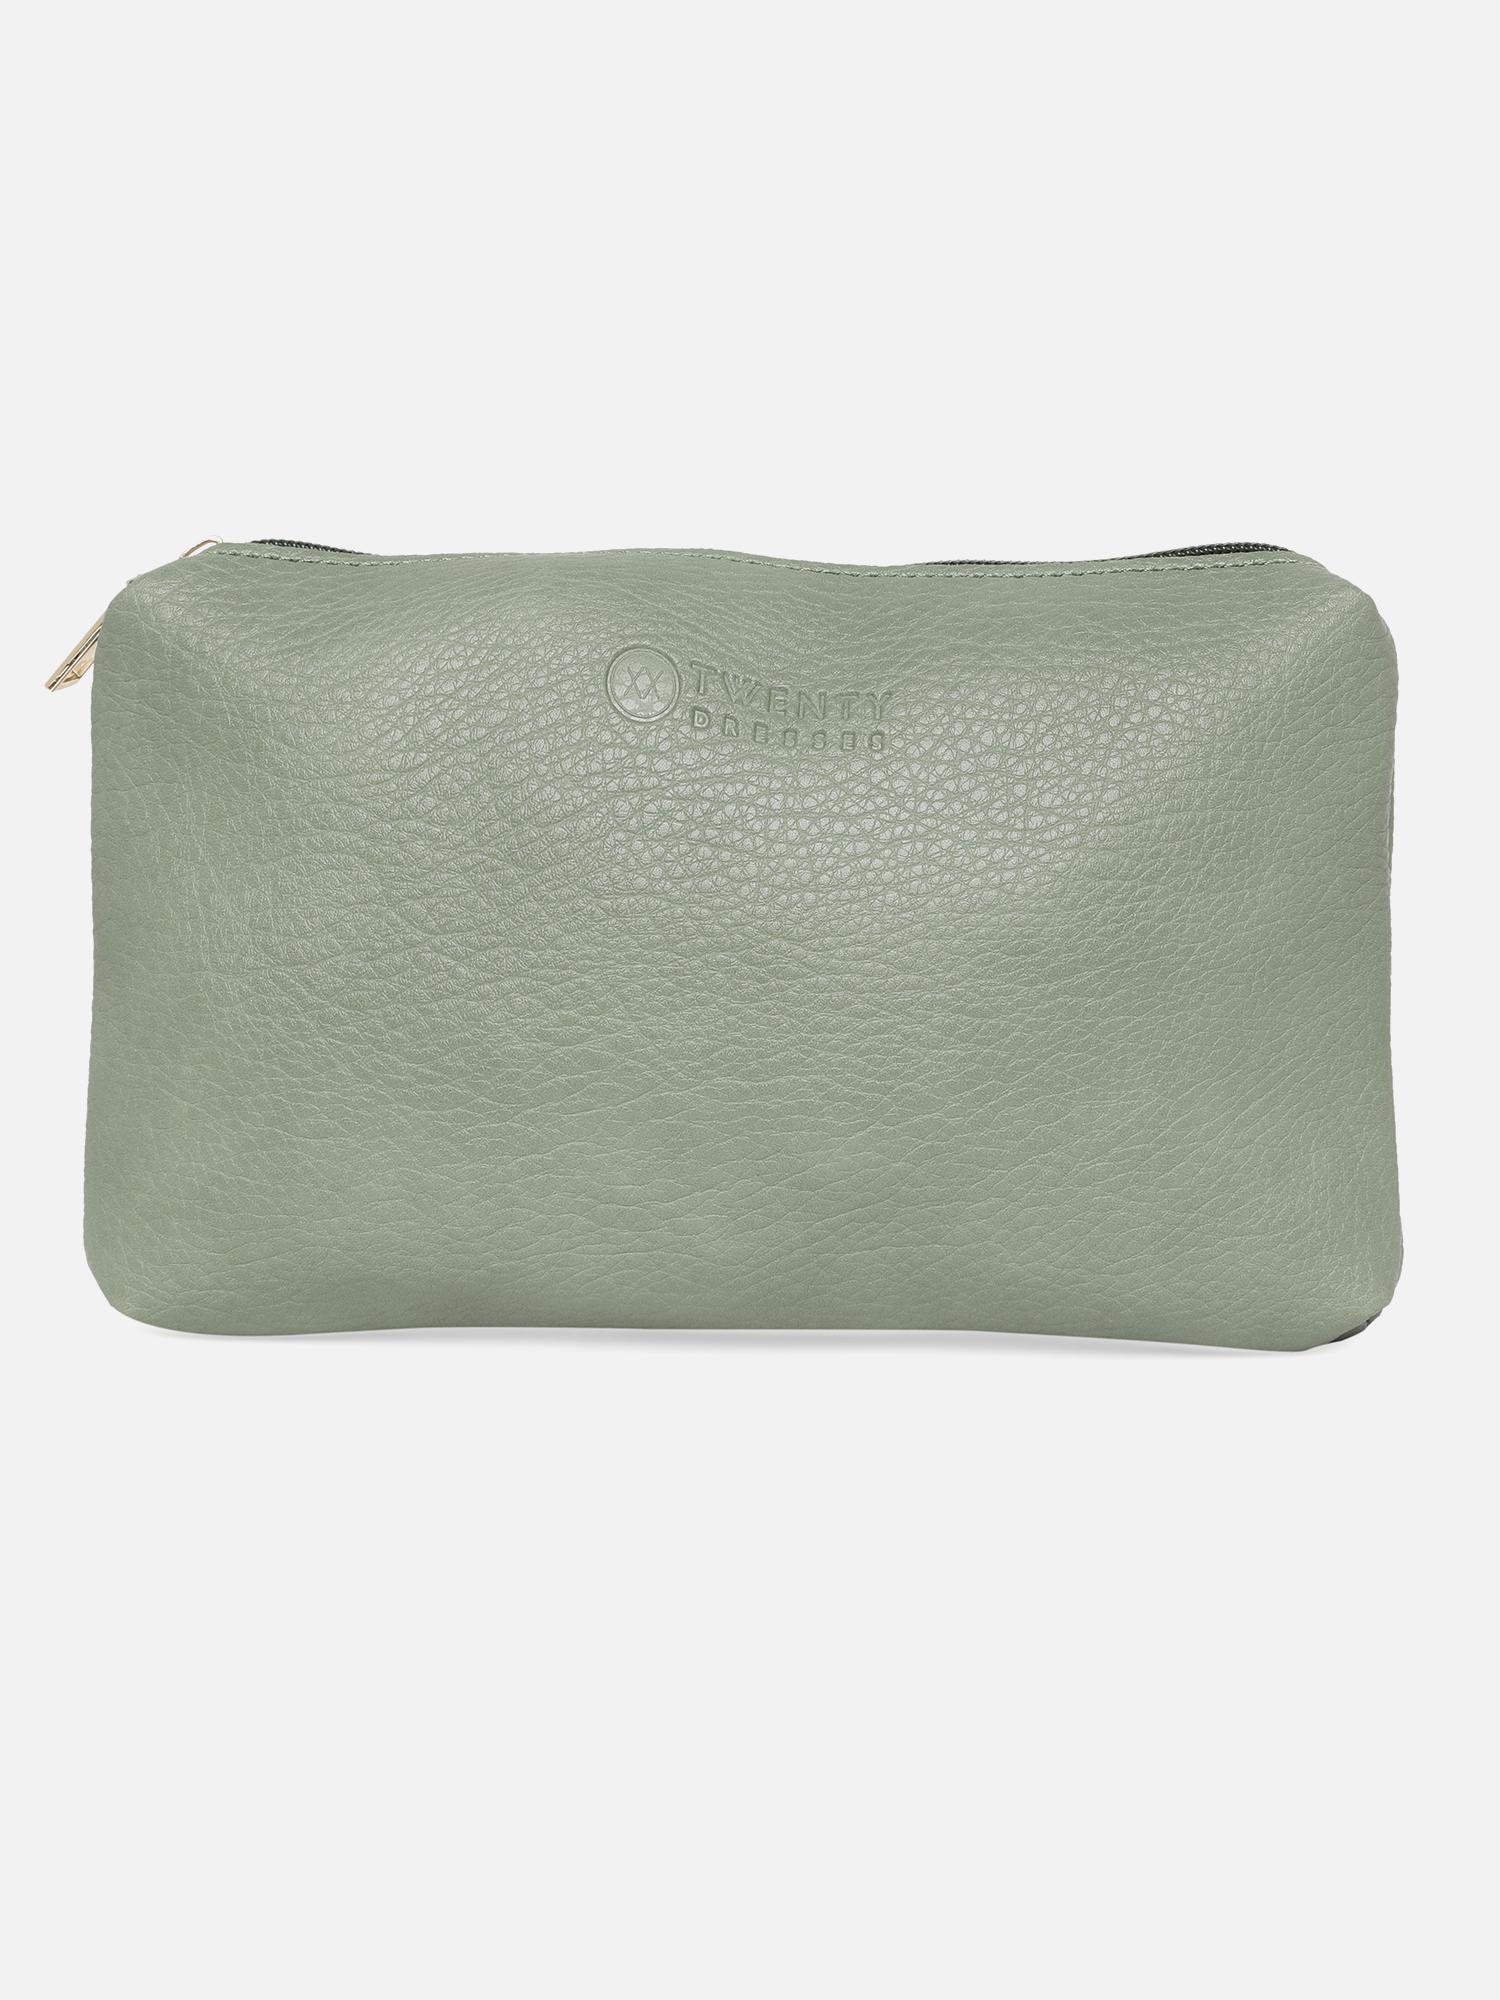 Hand Bags-Green On The Fringe Line Bag8